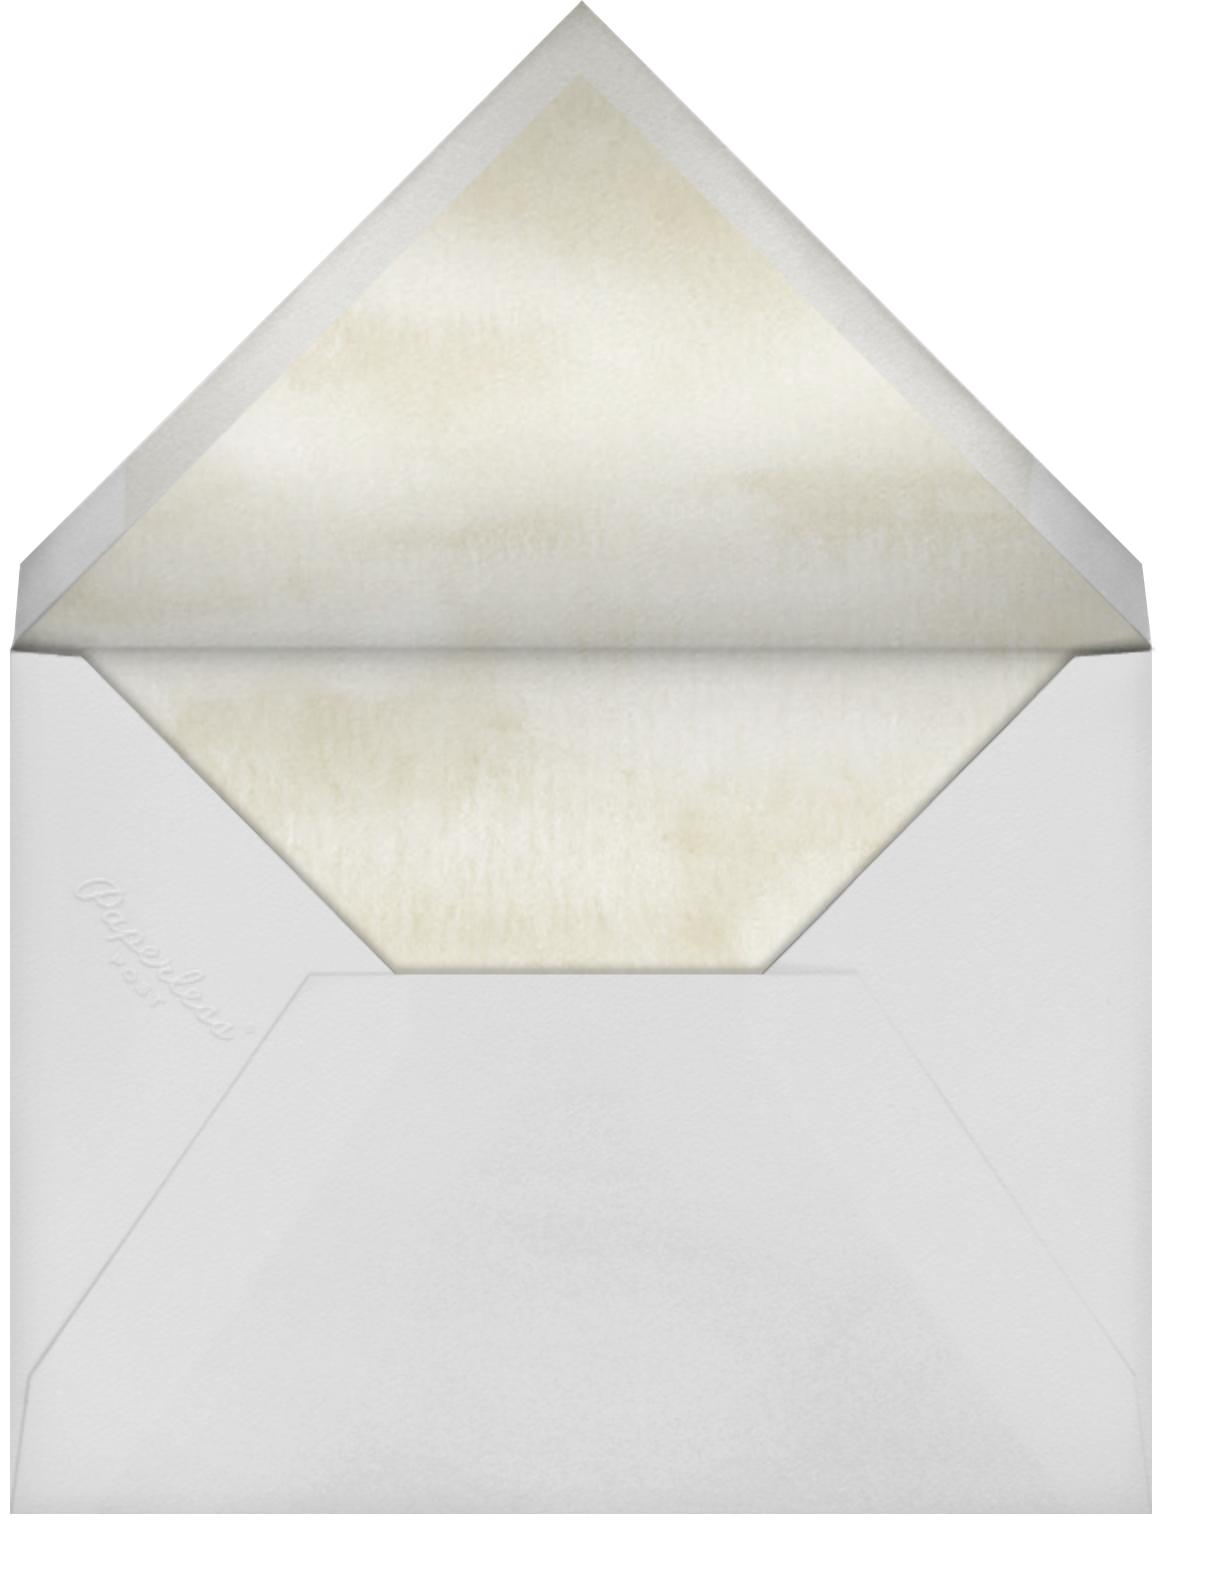 Naiad Photo - Felix Doolittle - Farewell party - envelope back